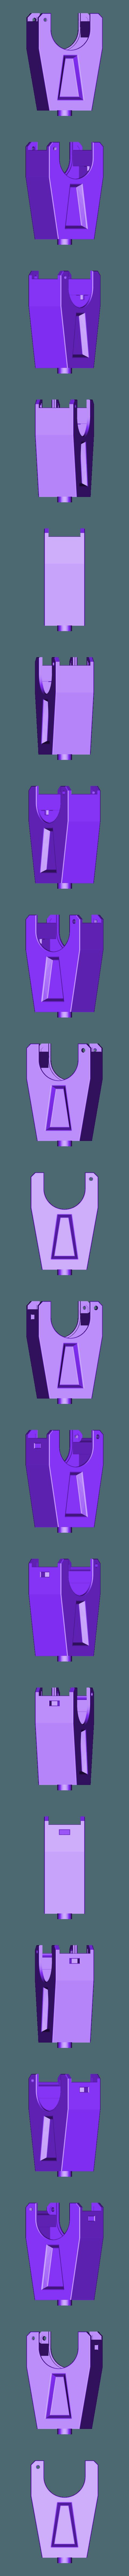 sinar-tripod-mount-(v1.7chmf)-pillar.stl Download STL file Sinar rail clamp (camera/tripod support) & F1 repairs • 3D printing object, vintage-lens